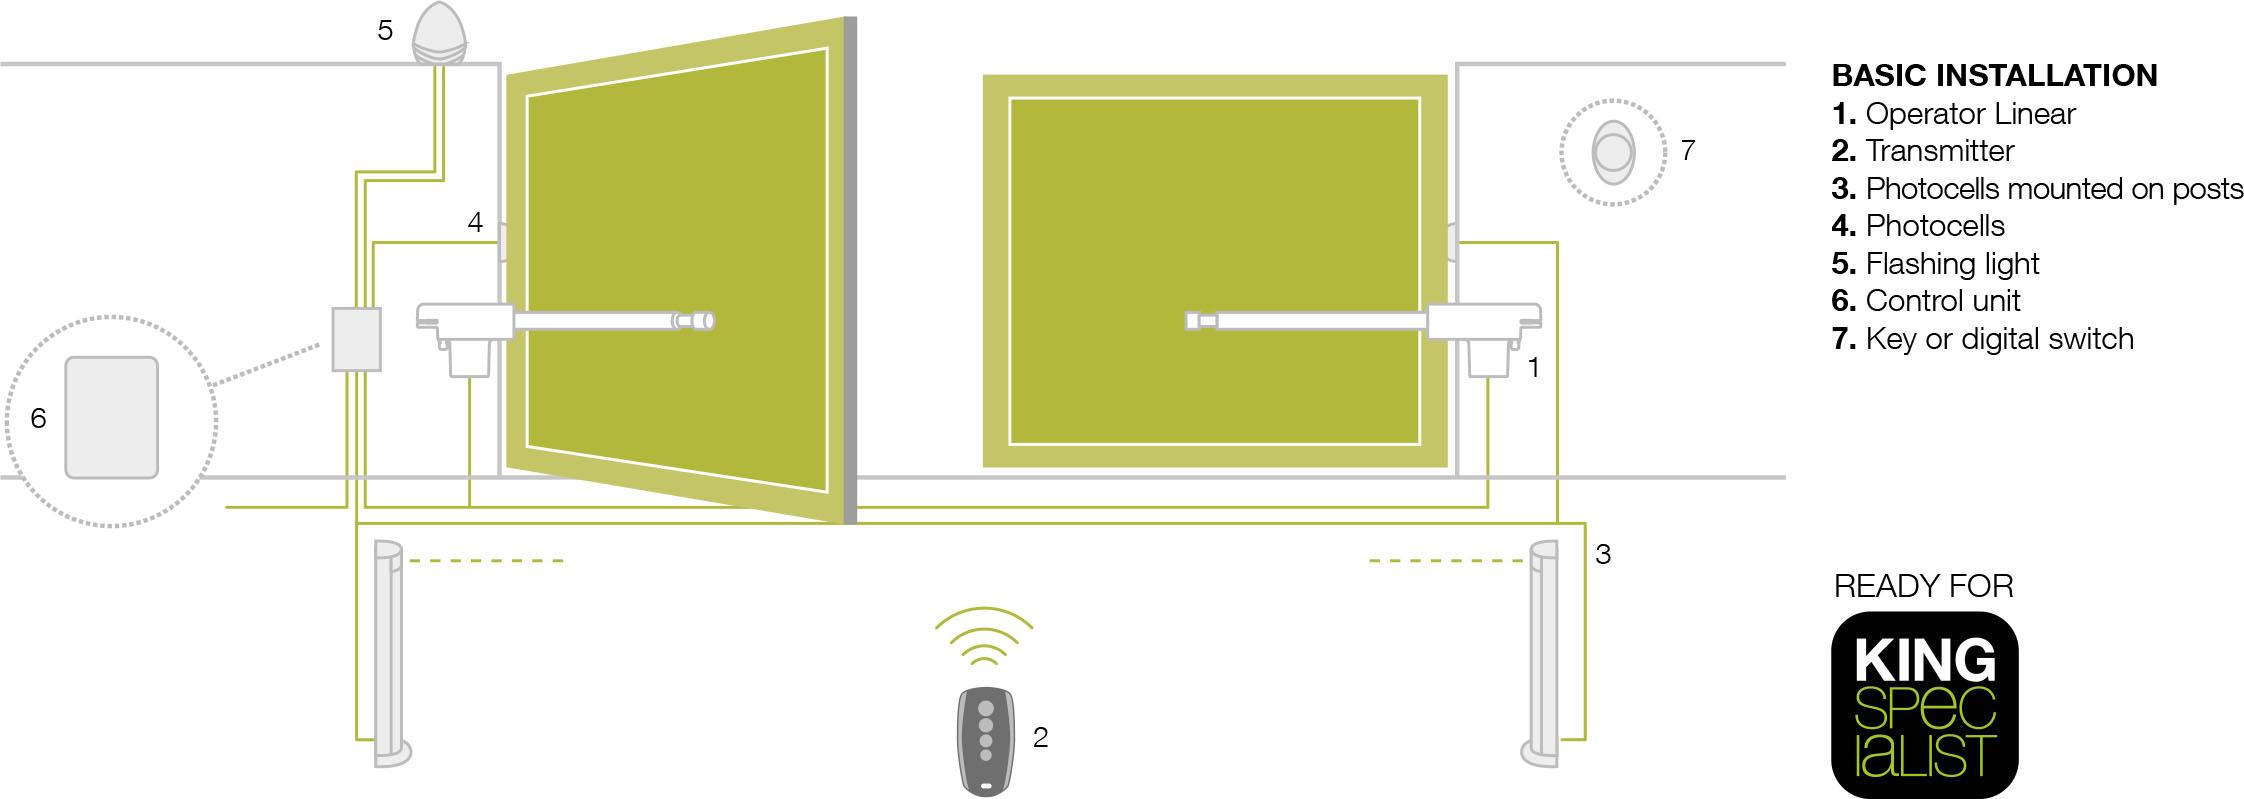 automatic swing gate underground swing gate double leave swing gate remote control swing gate sensor gate GSM bluetooth smart control gate heavy duty gate car gate villa residential home entrance gate